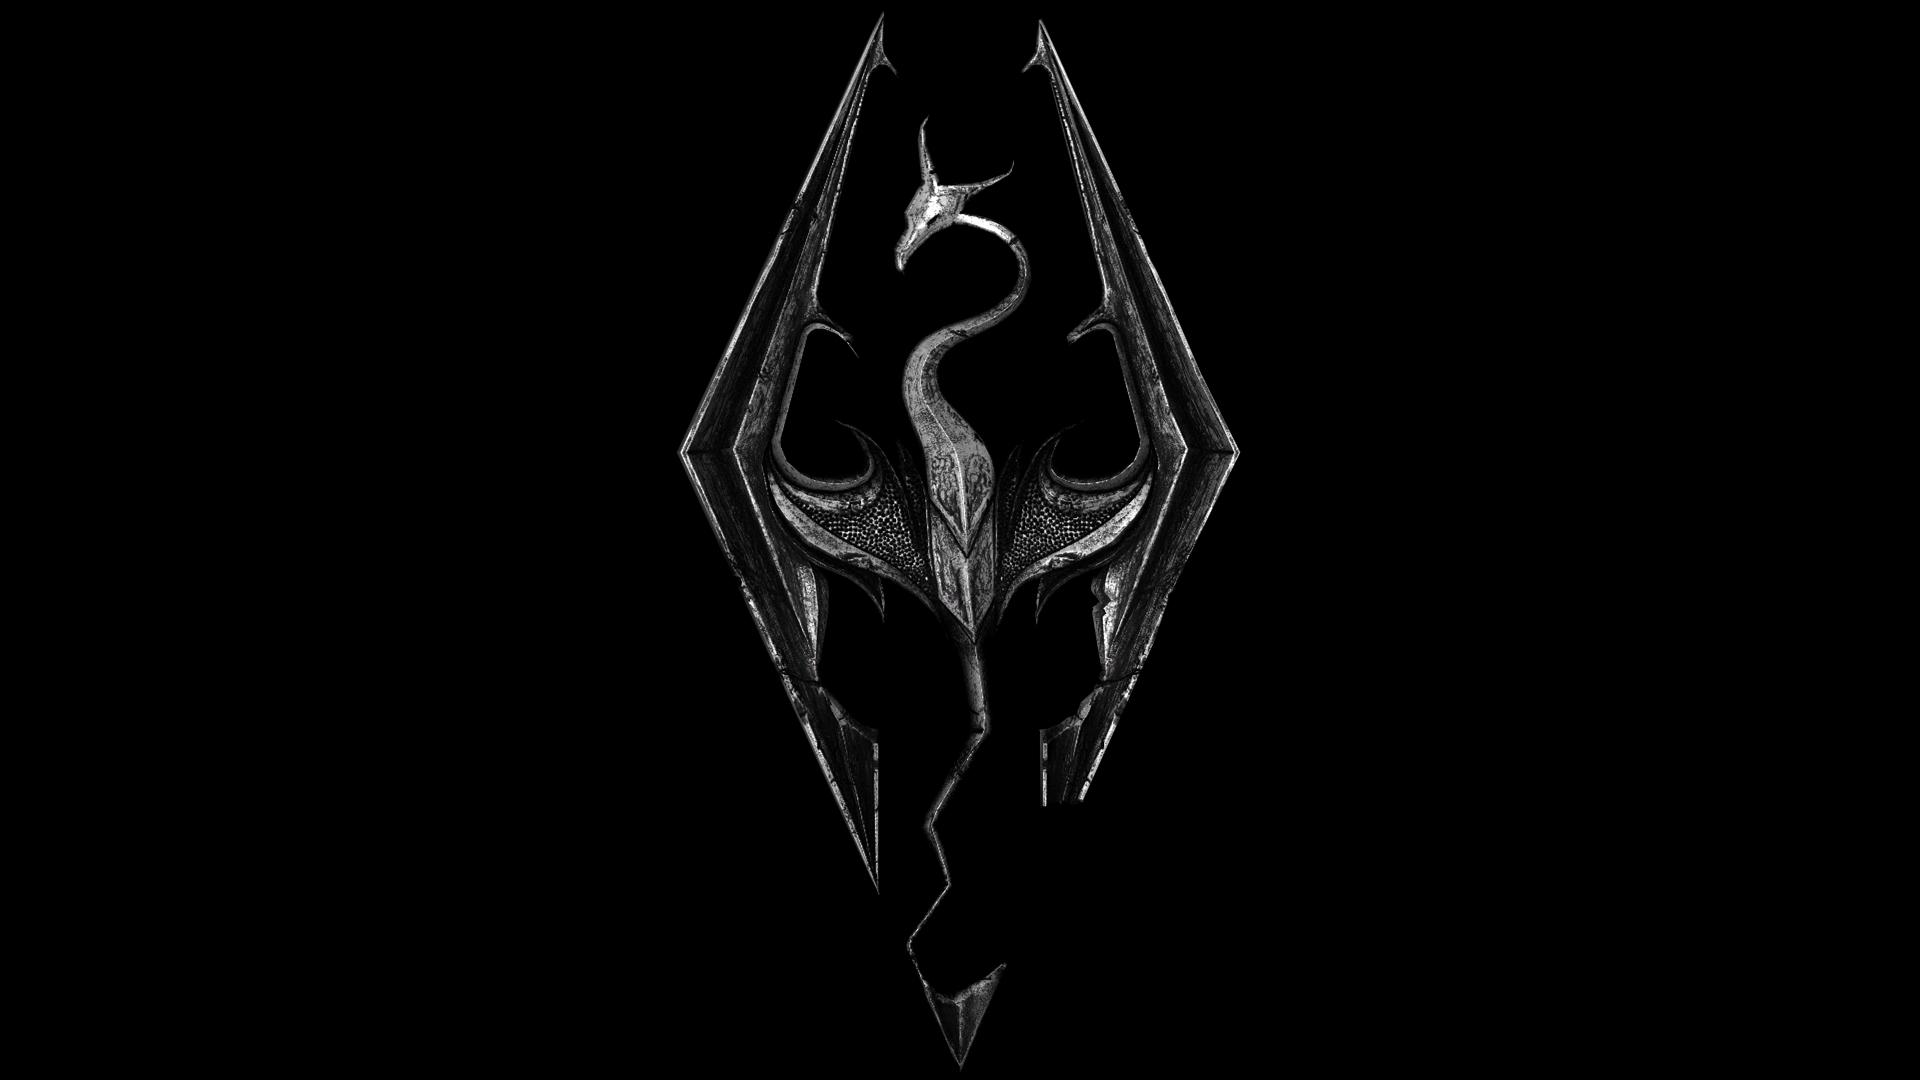 skyrim logo wallpaper - sf wallpaper